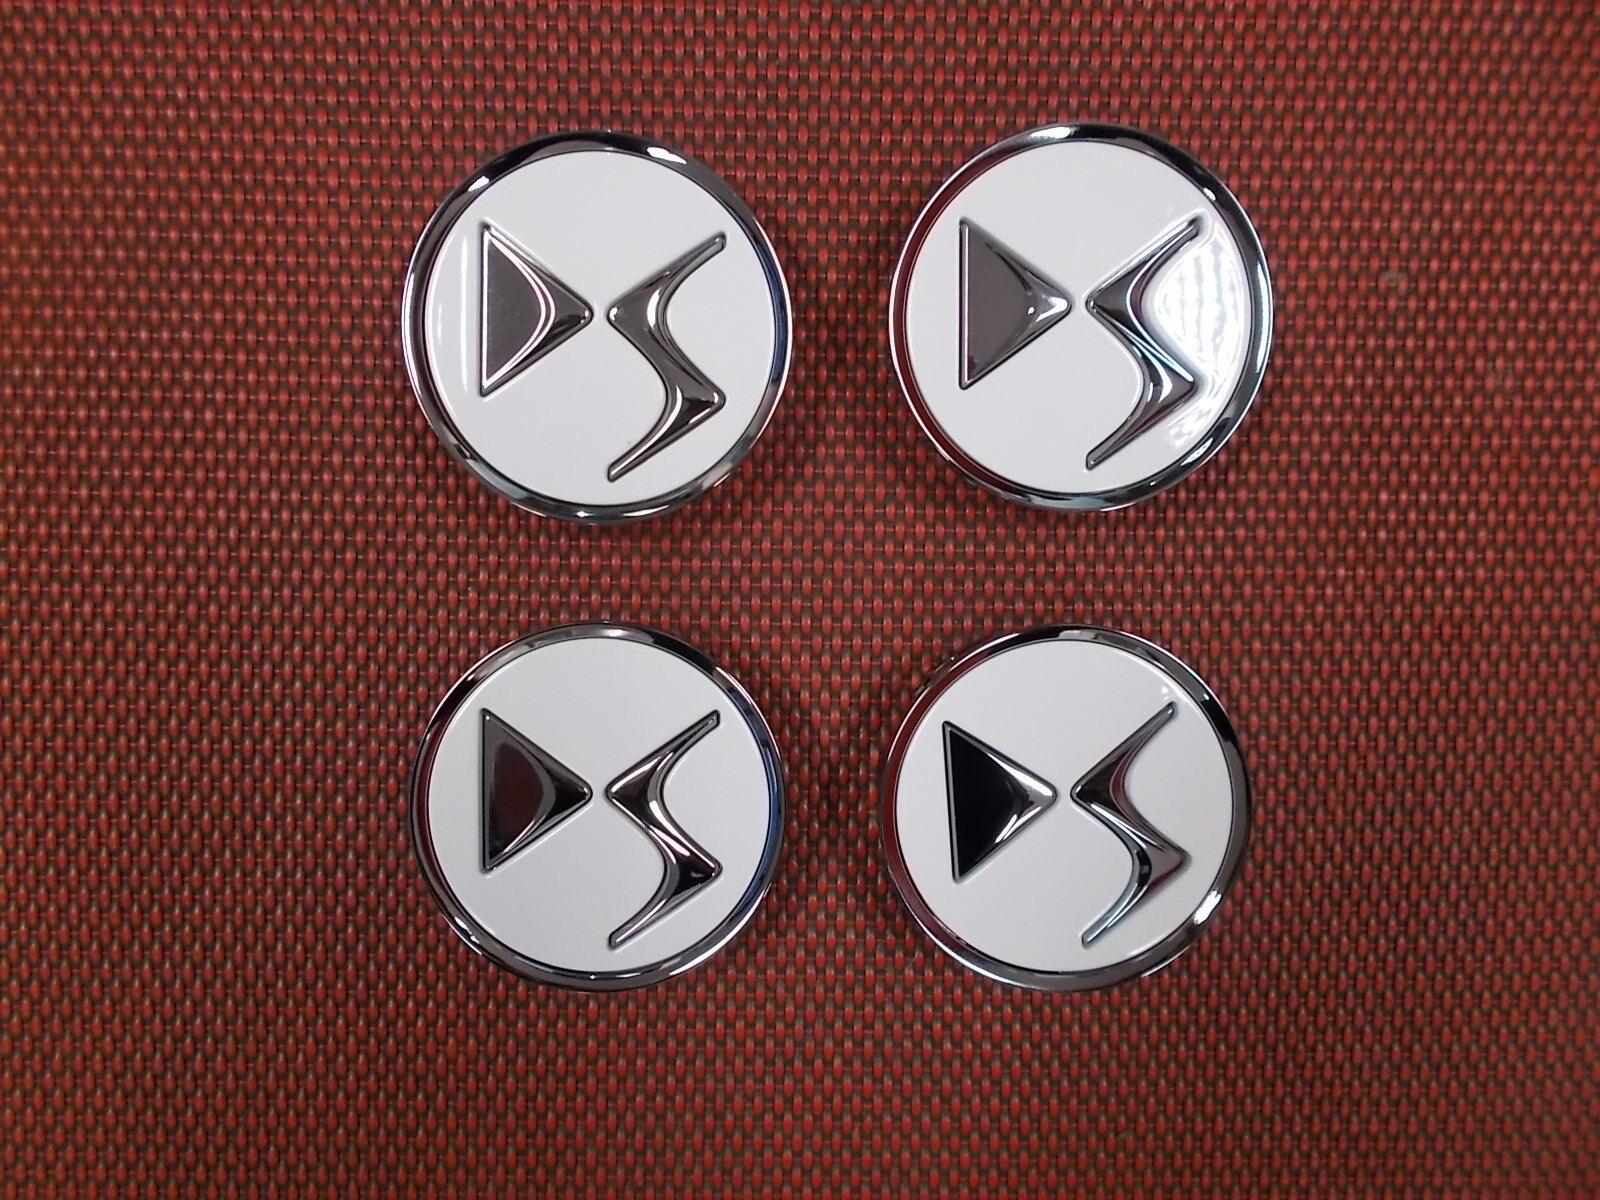 10 X 2 Kolben clip 12MM für Honda Diamo Adiva E-ton Kymco Atala Rieju derbi